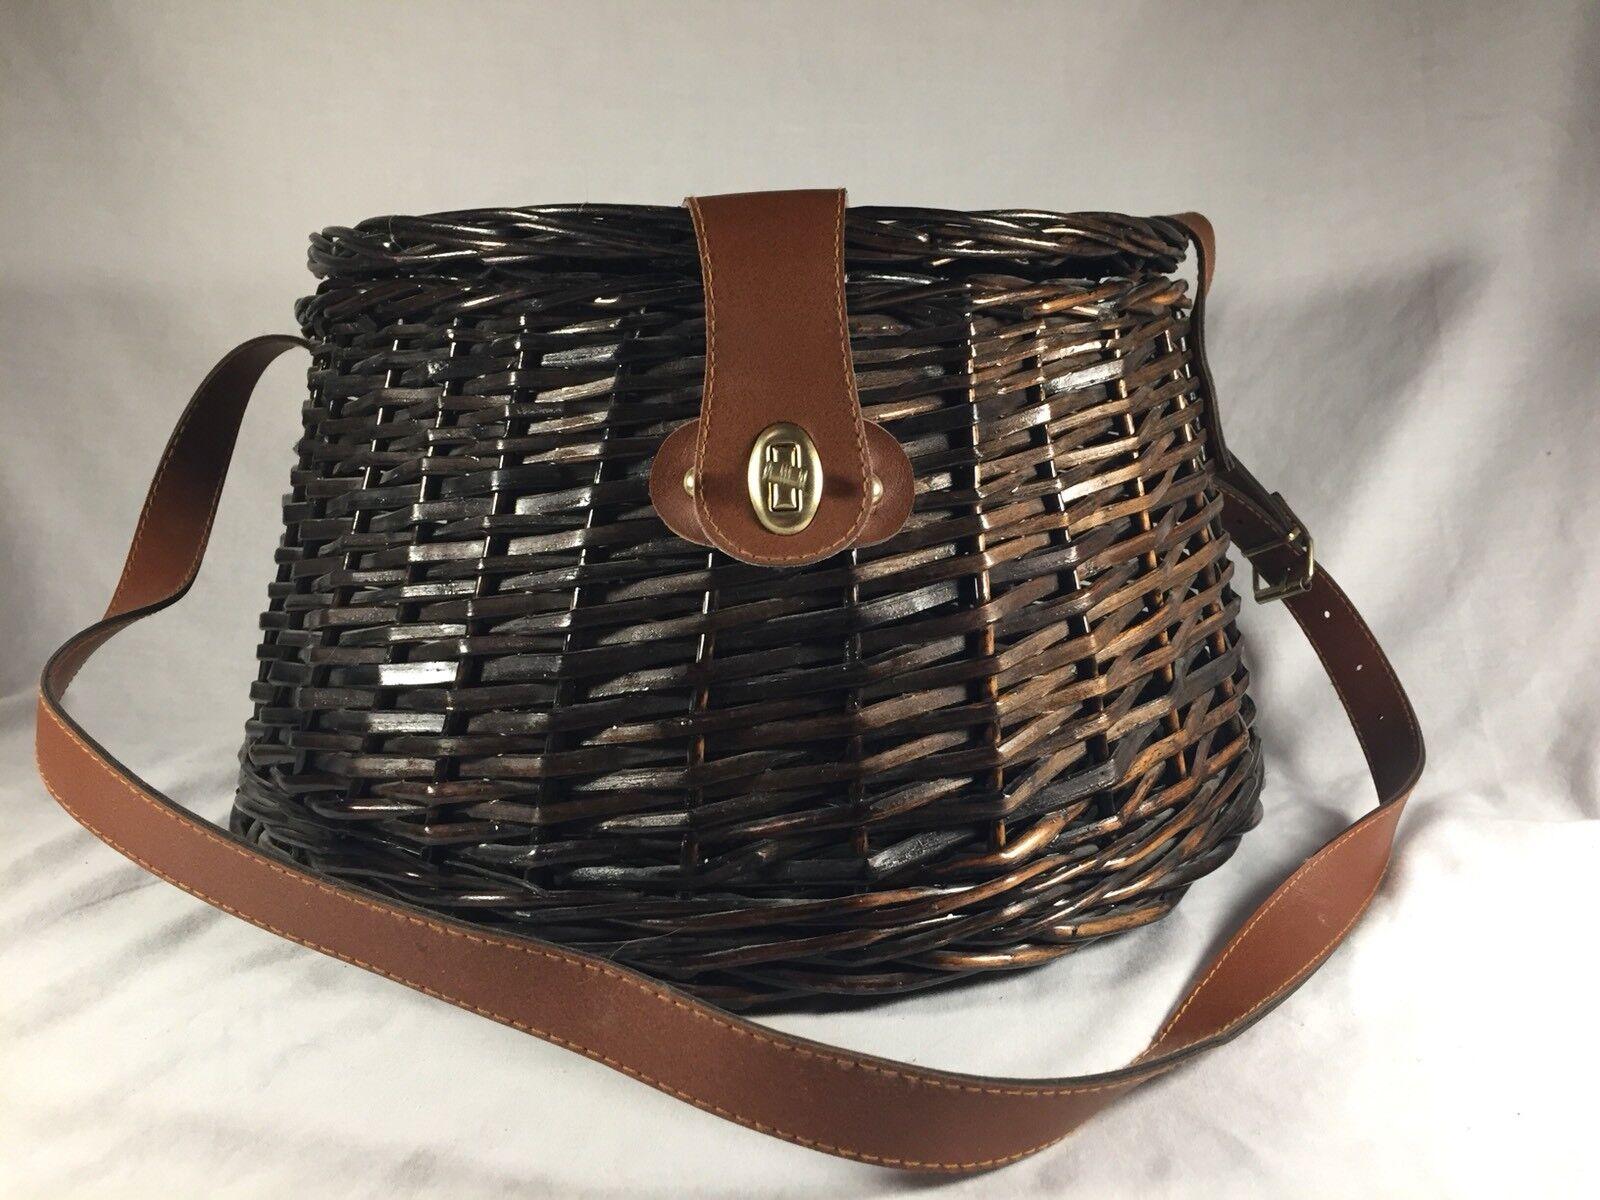 Vintage Fishing Creel Basket Weaved Leather Strap Large Creel